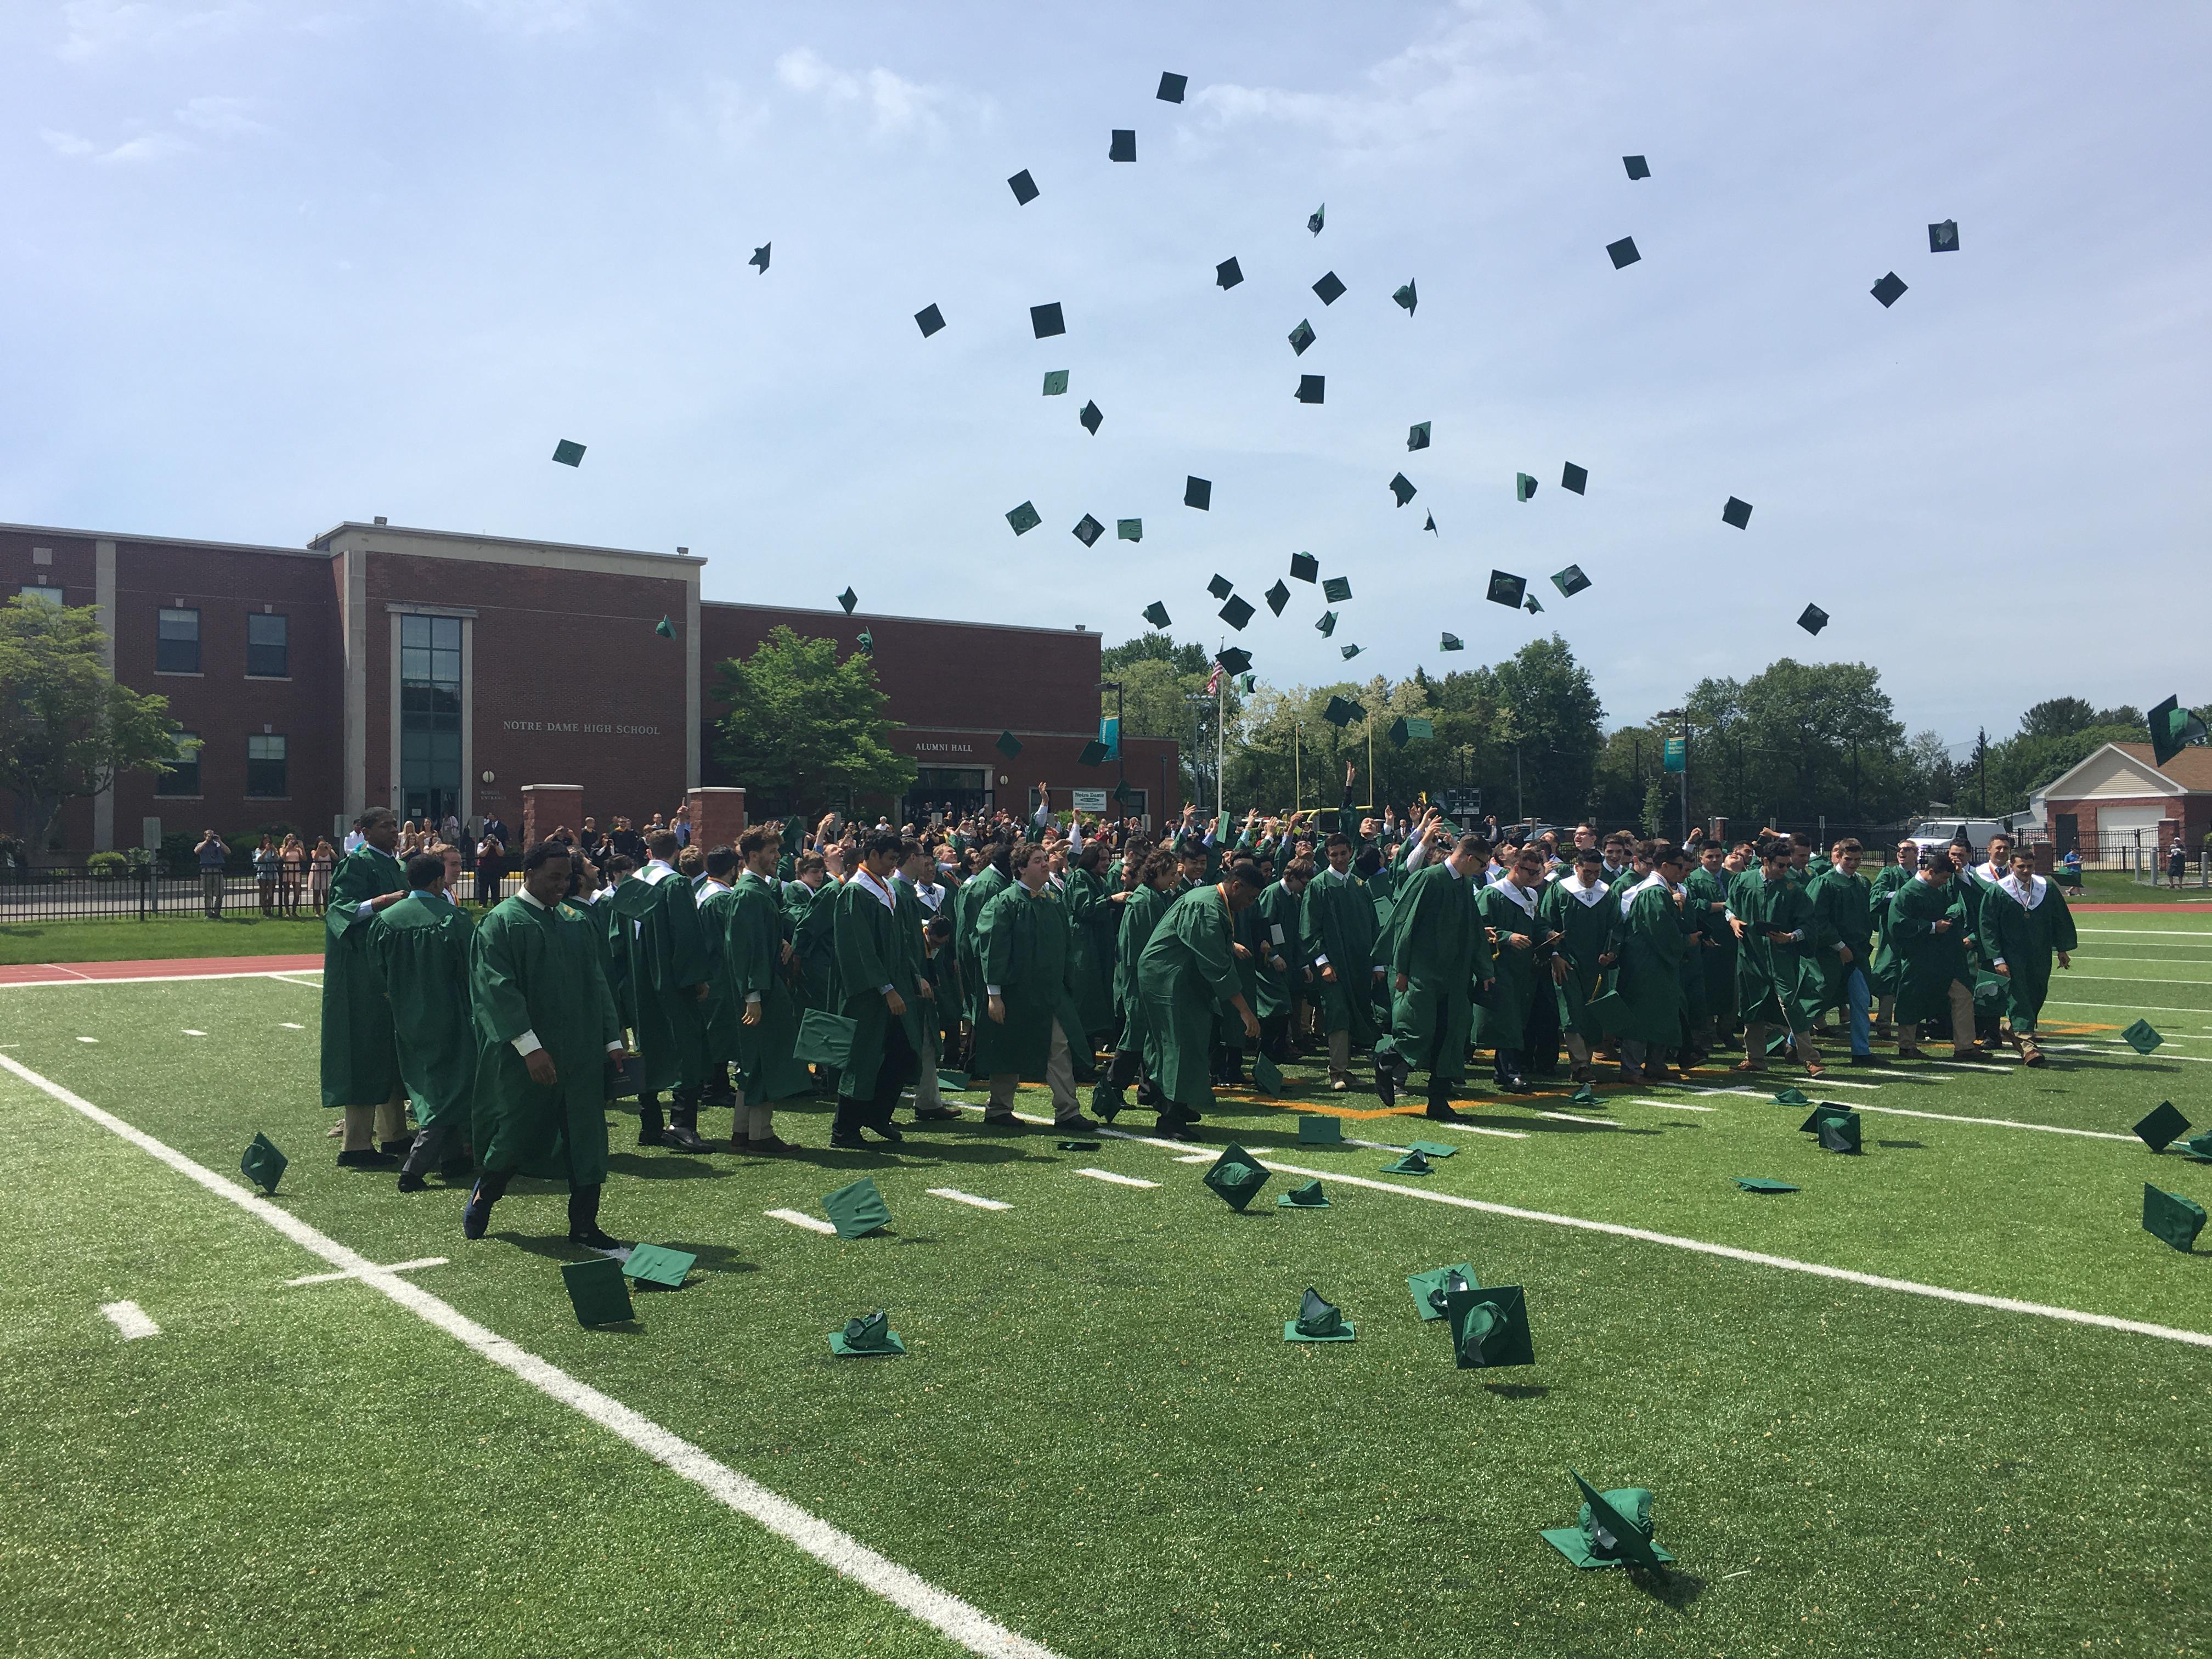 Notre Dame graduates 141 in 2017